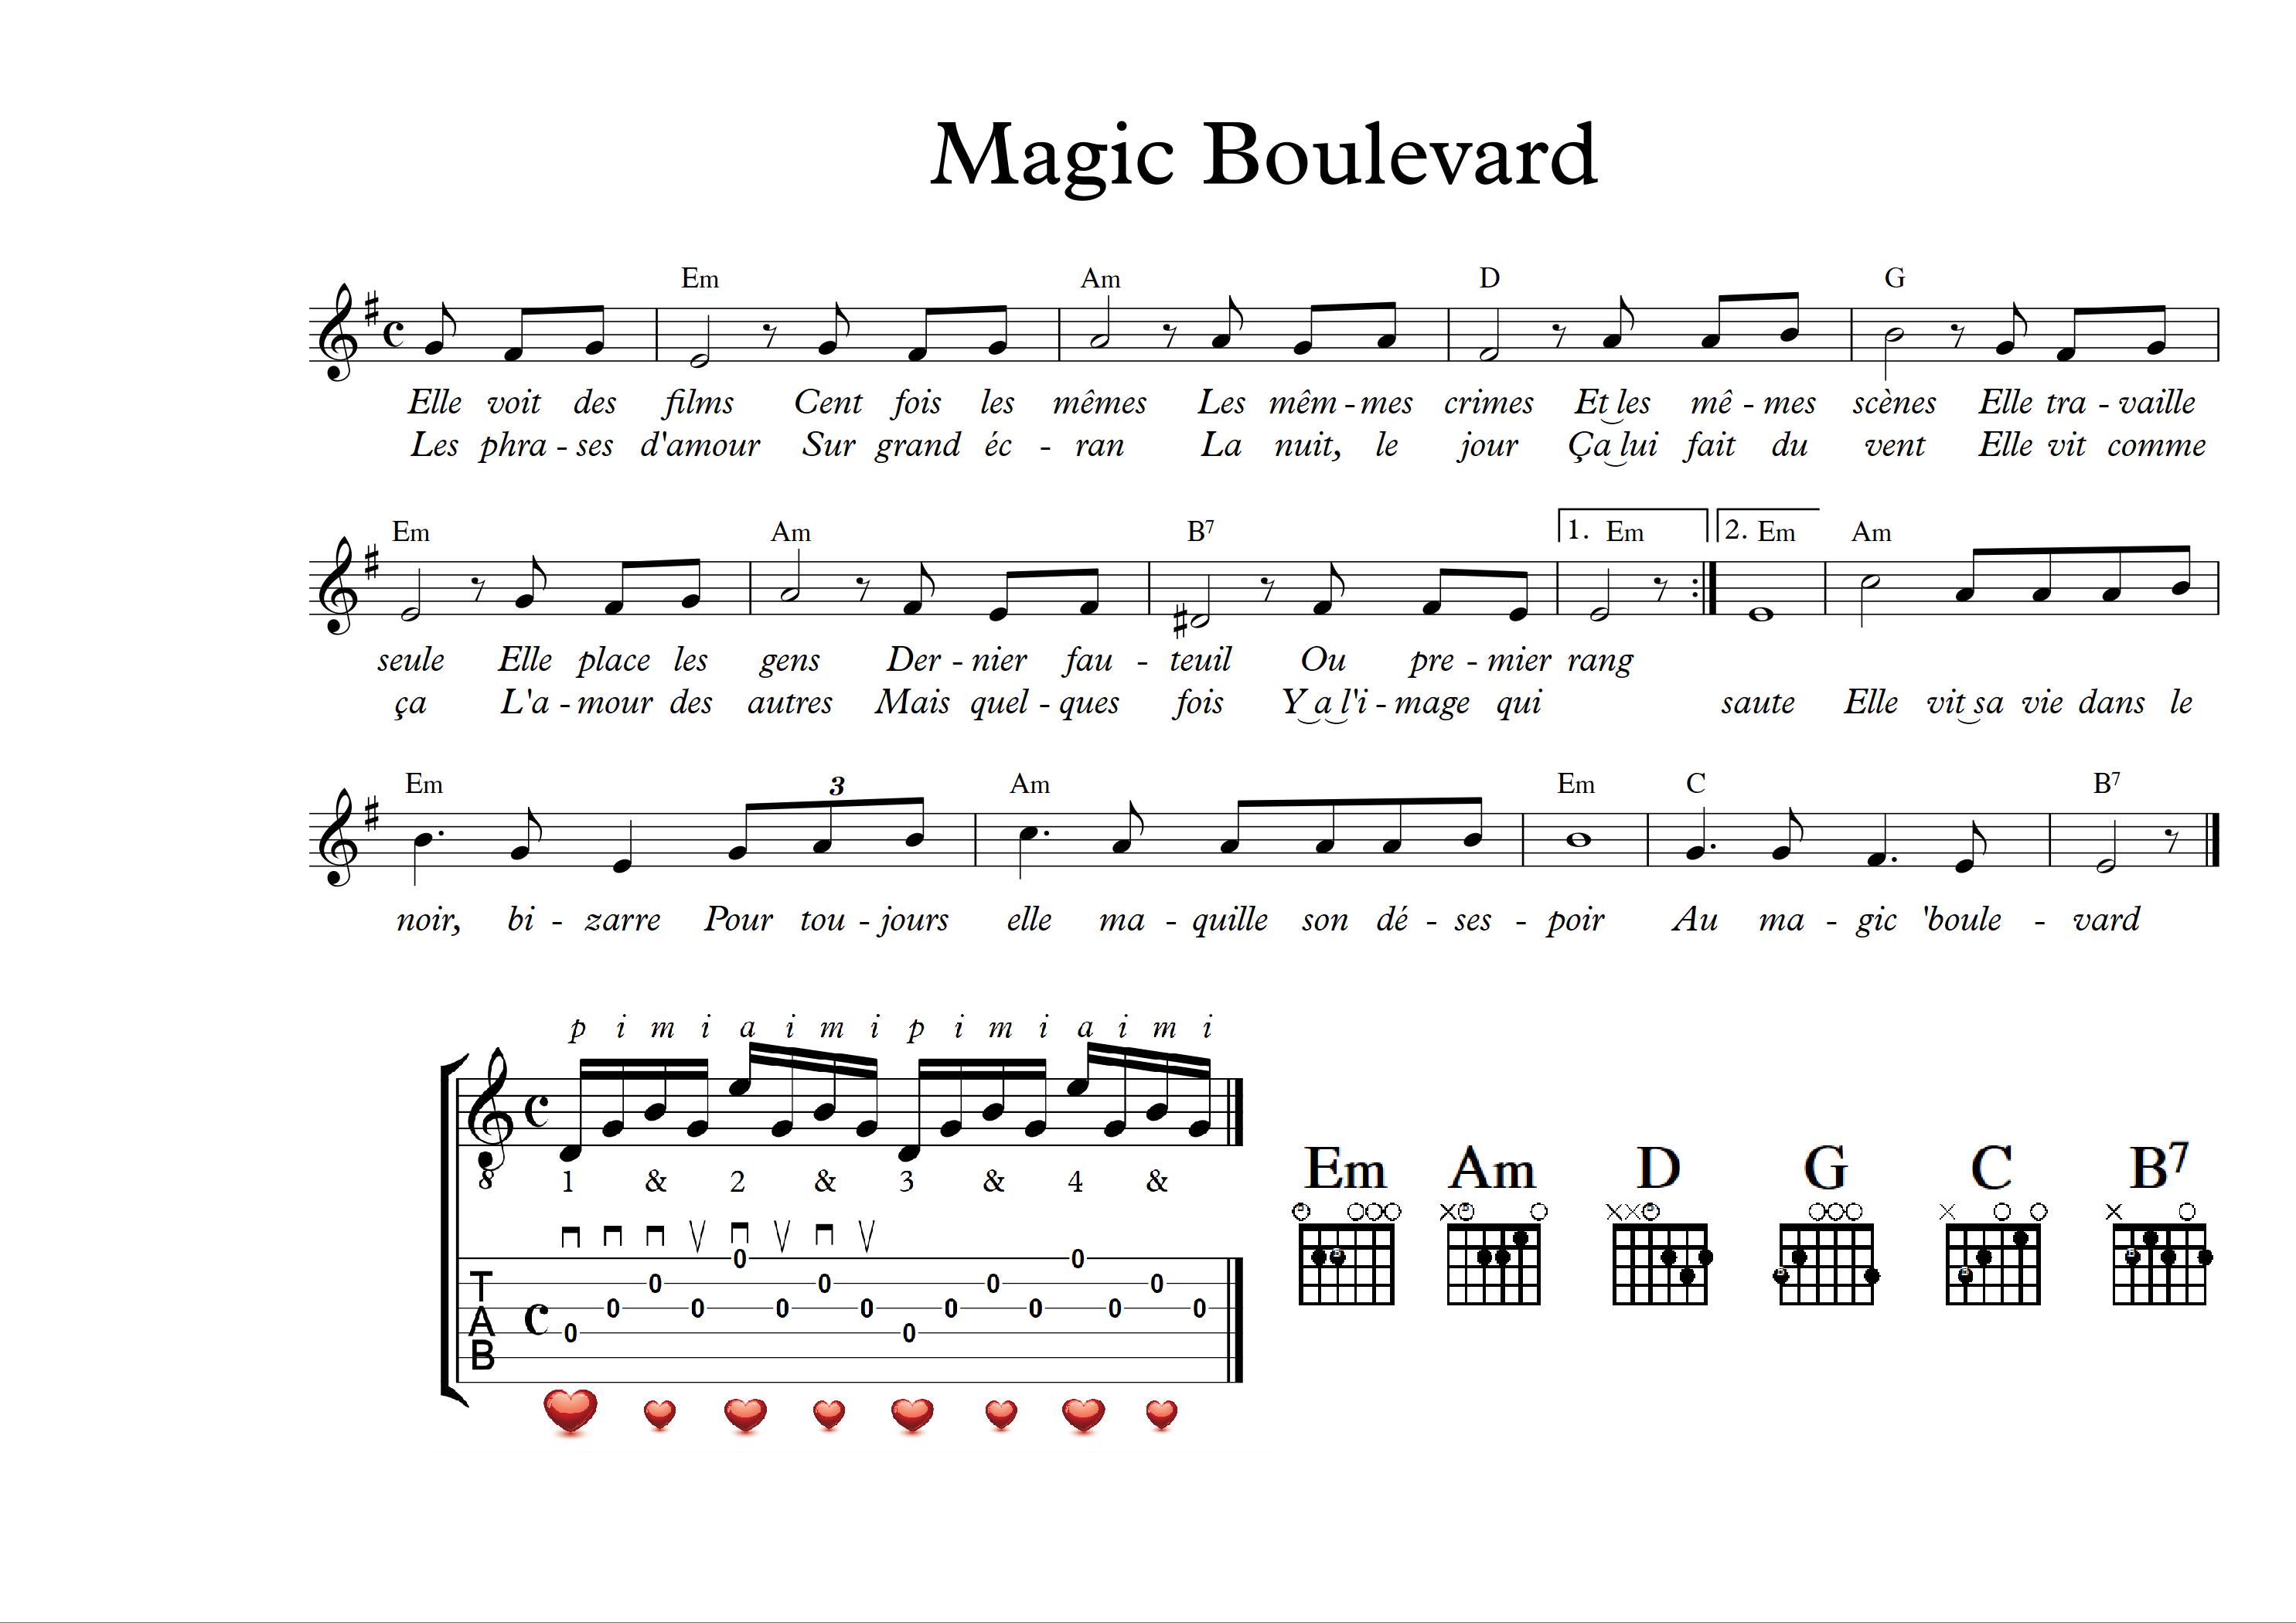 Sheet nhạc bài hát magics boulevard